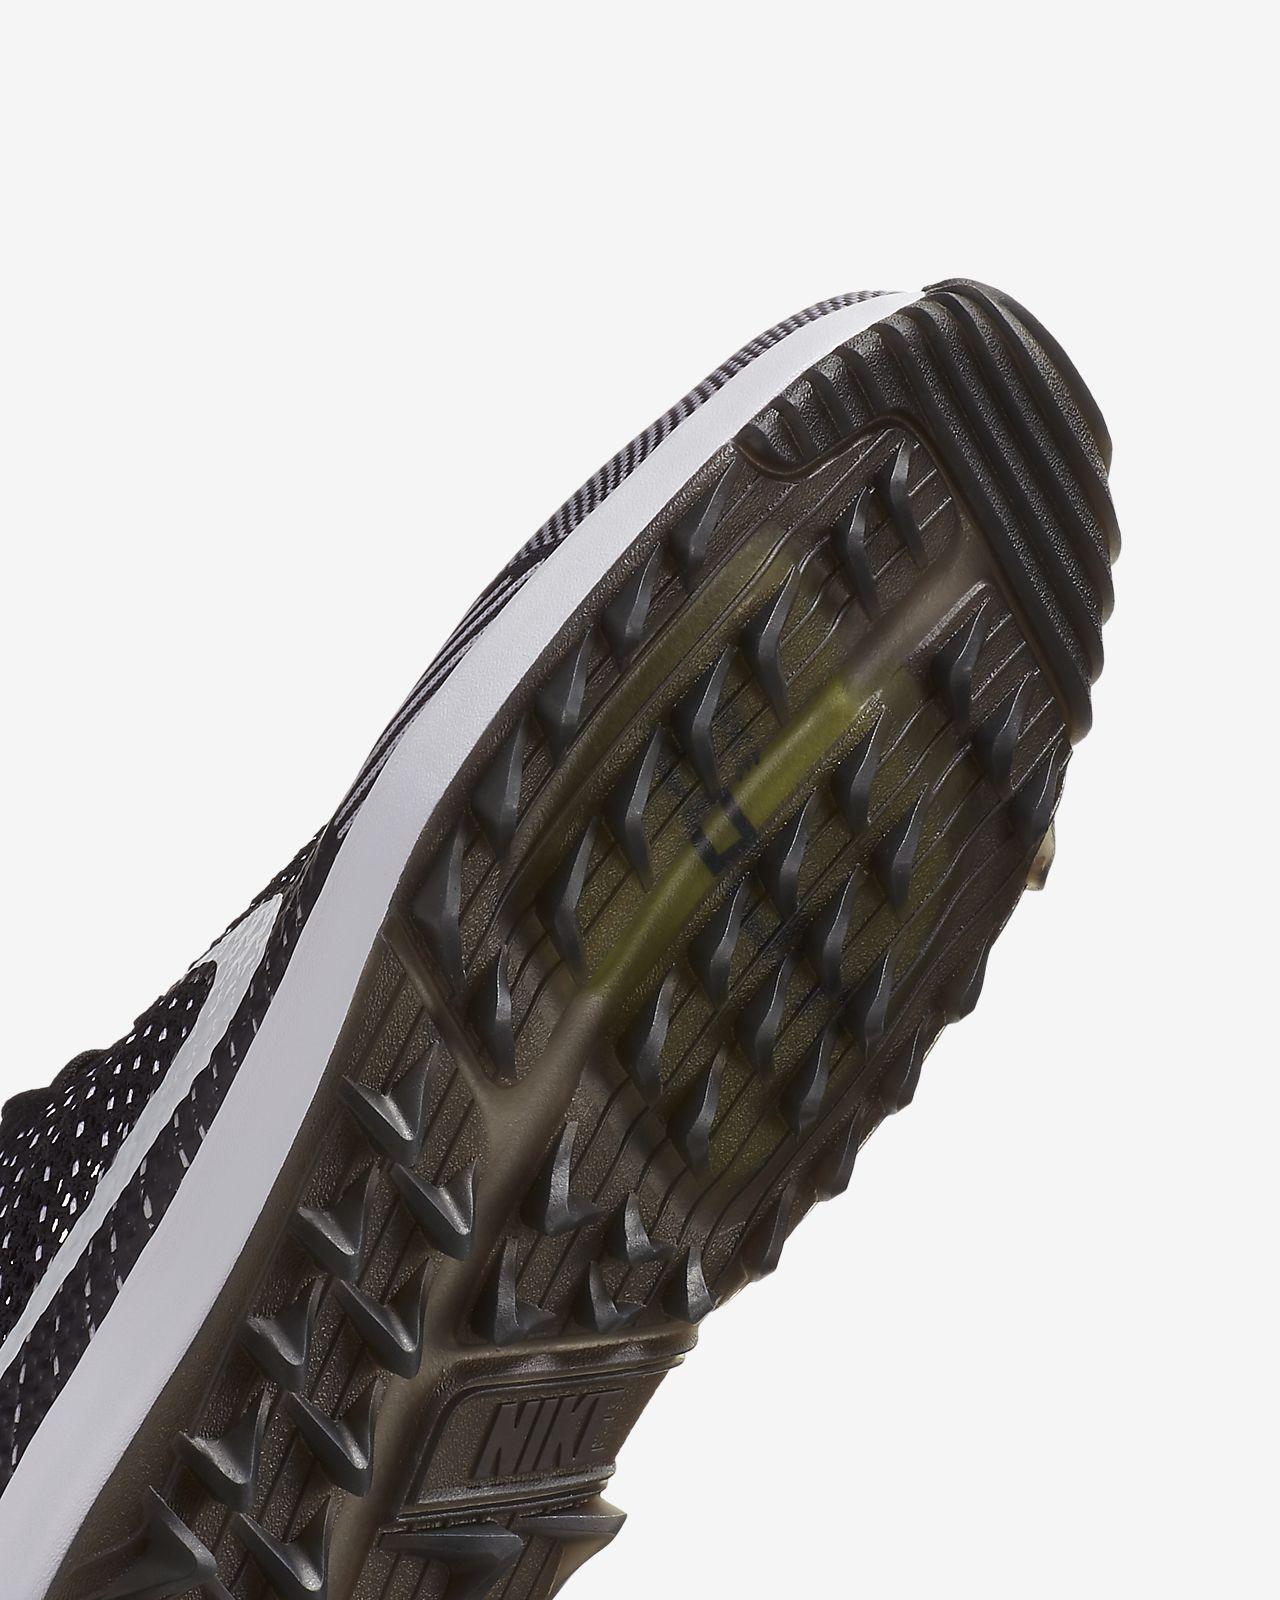 0b7c9c95bddb Nike Flyknit Racer G Men s Golf Shoe. Nike.com CA